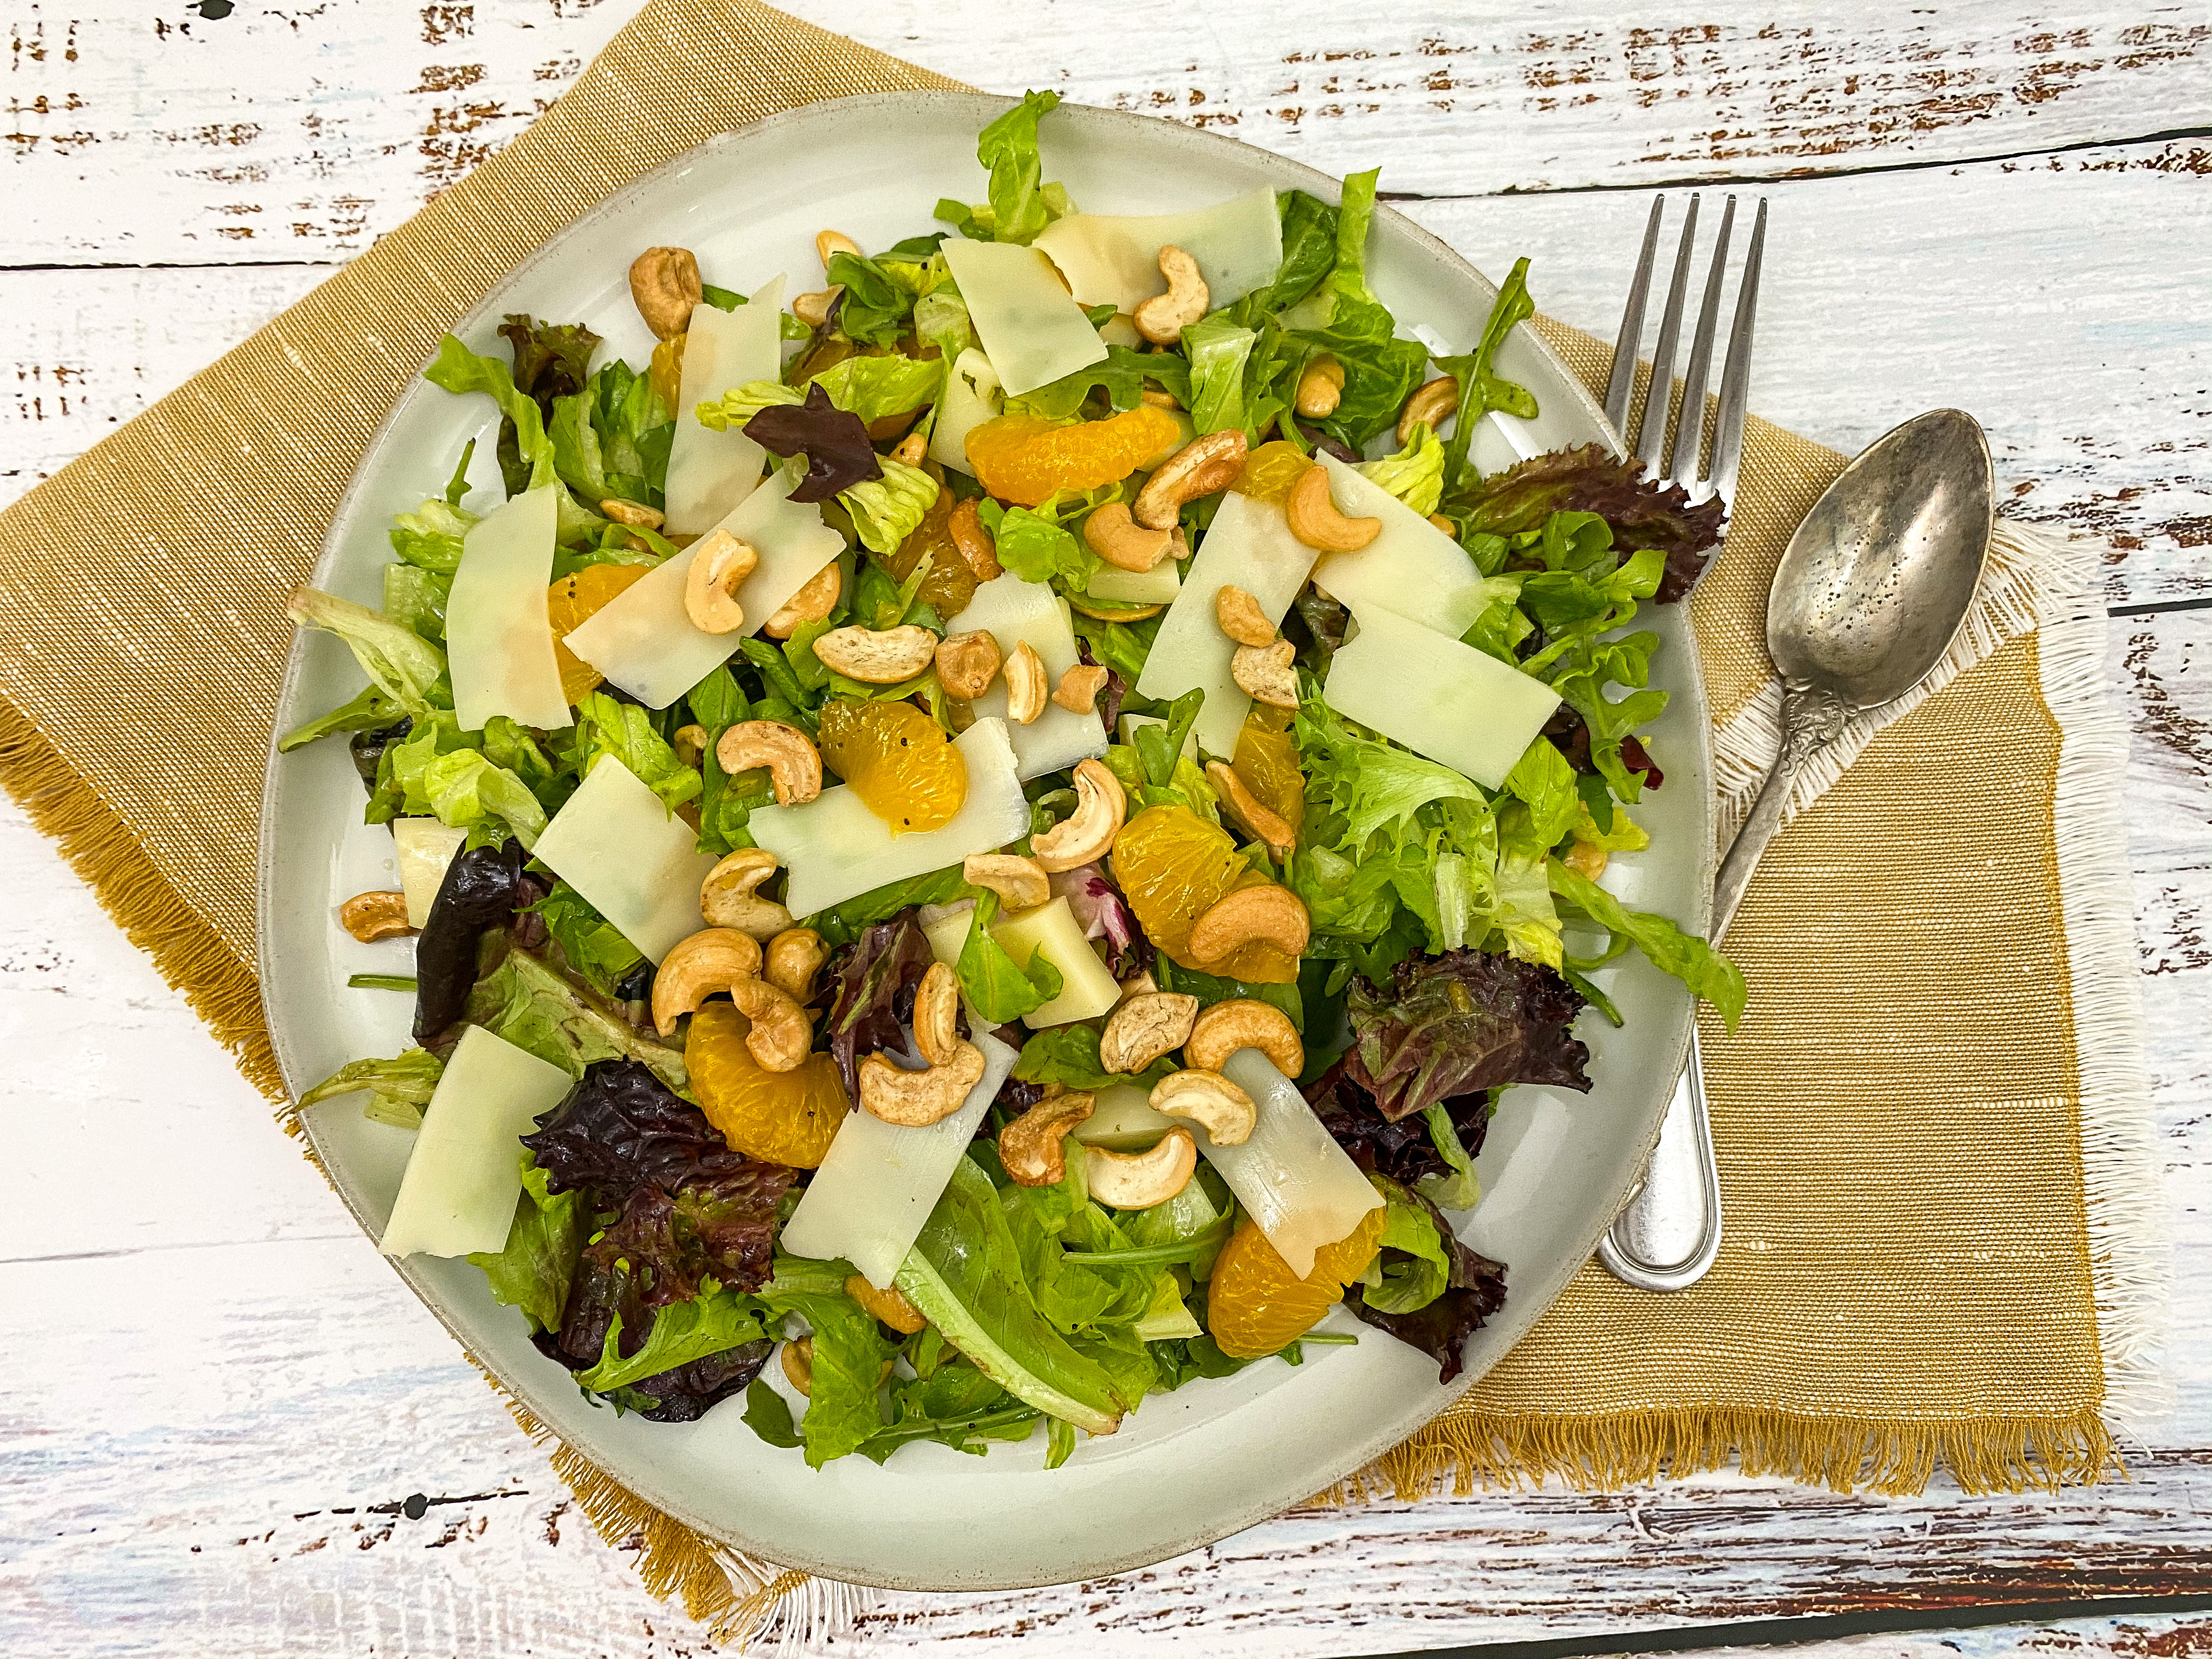 Cashew and Swiss Salad + Honey Poppy Seed Dressing